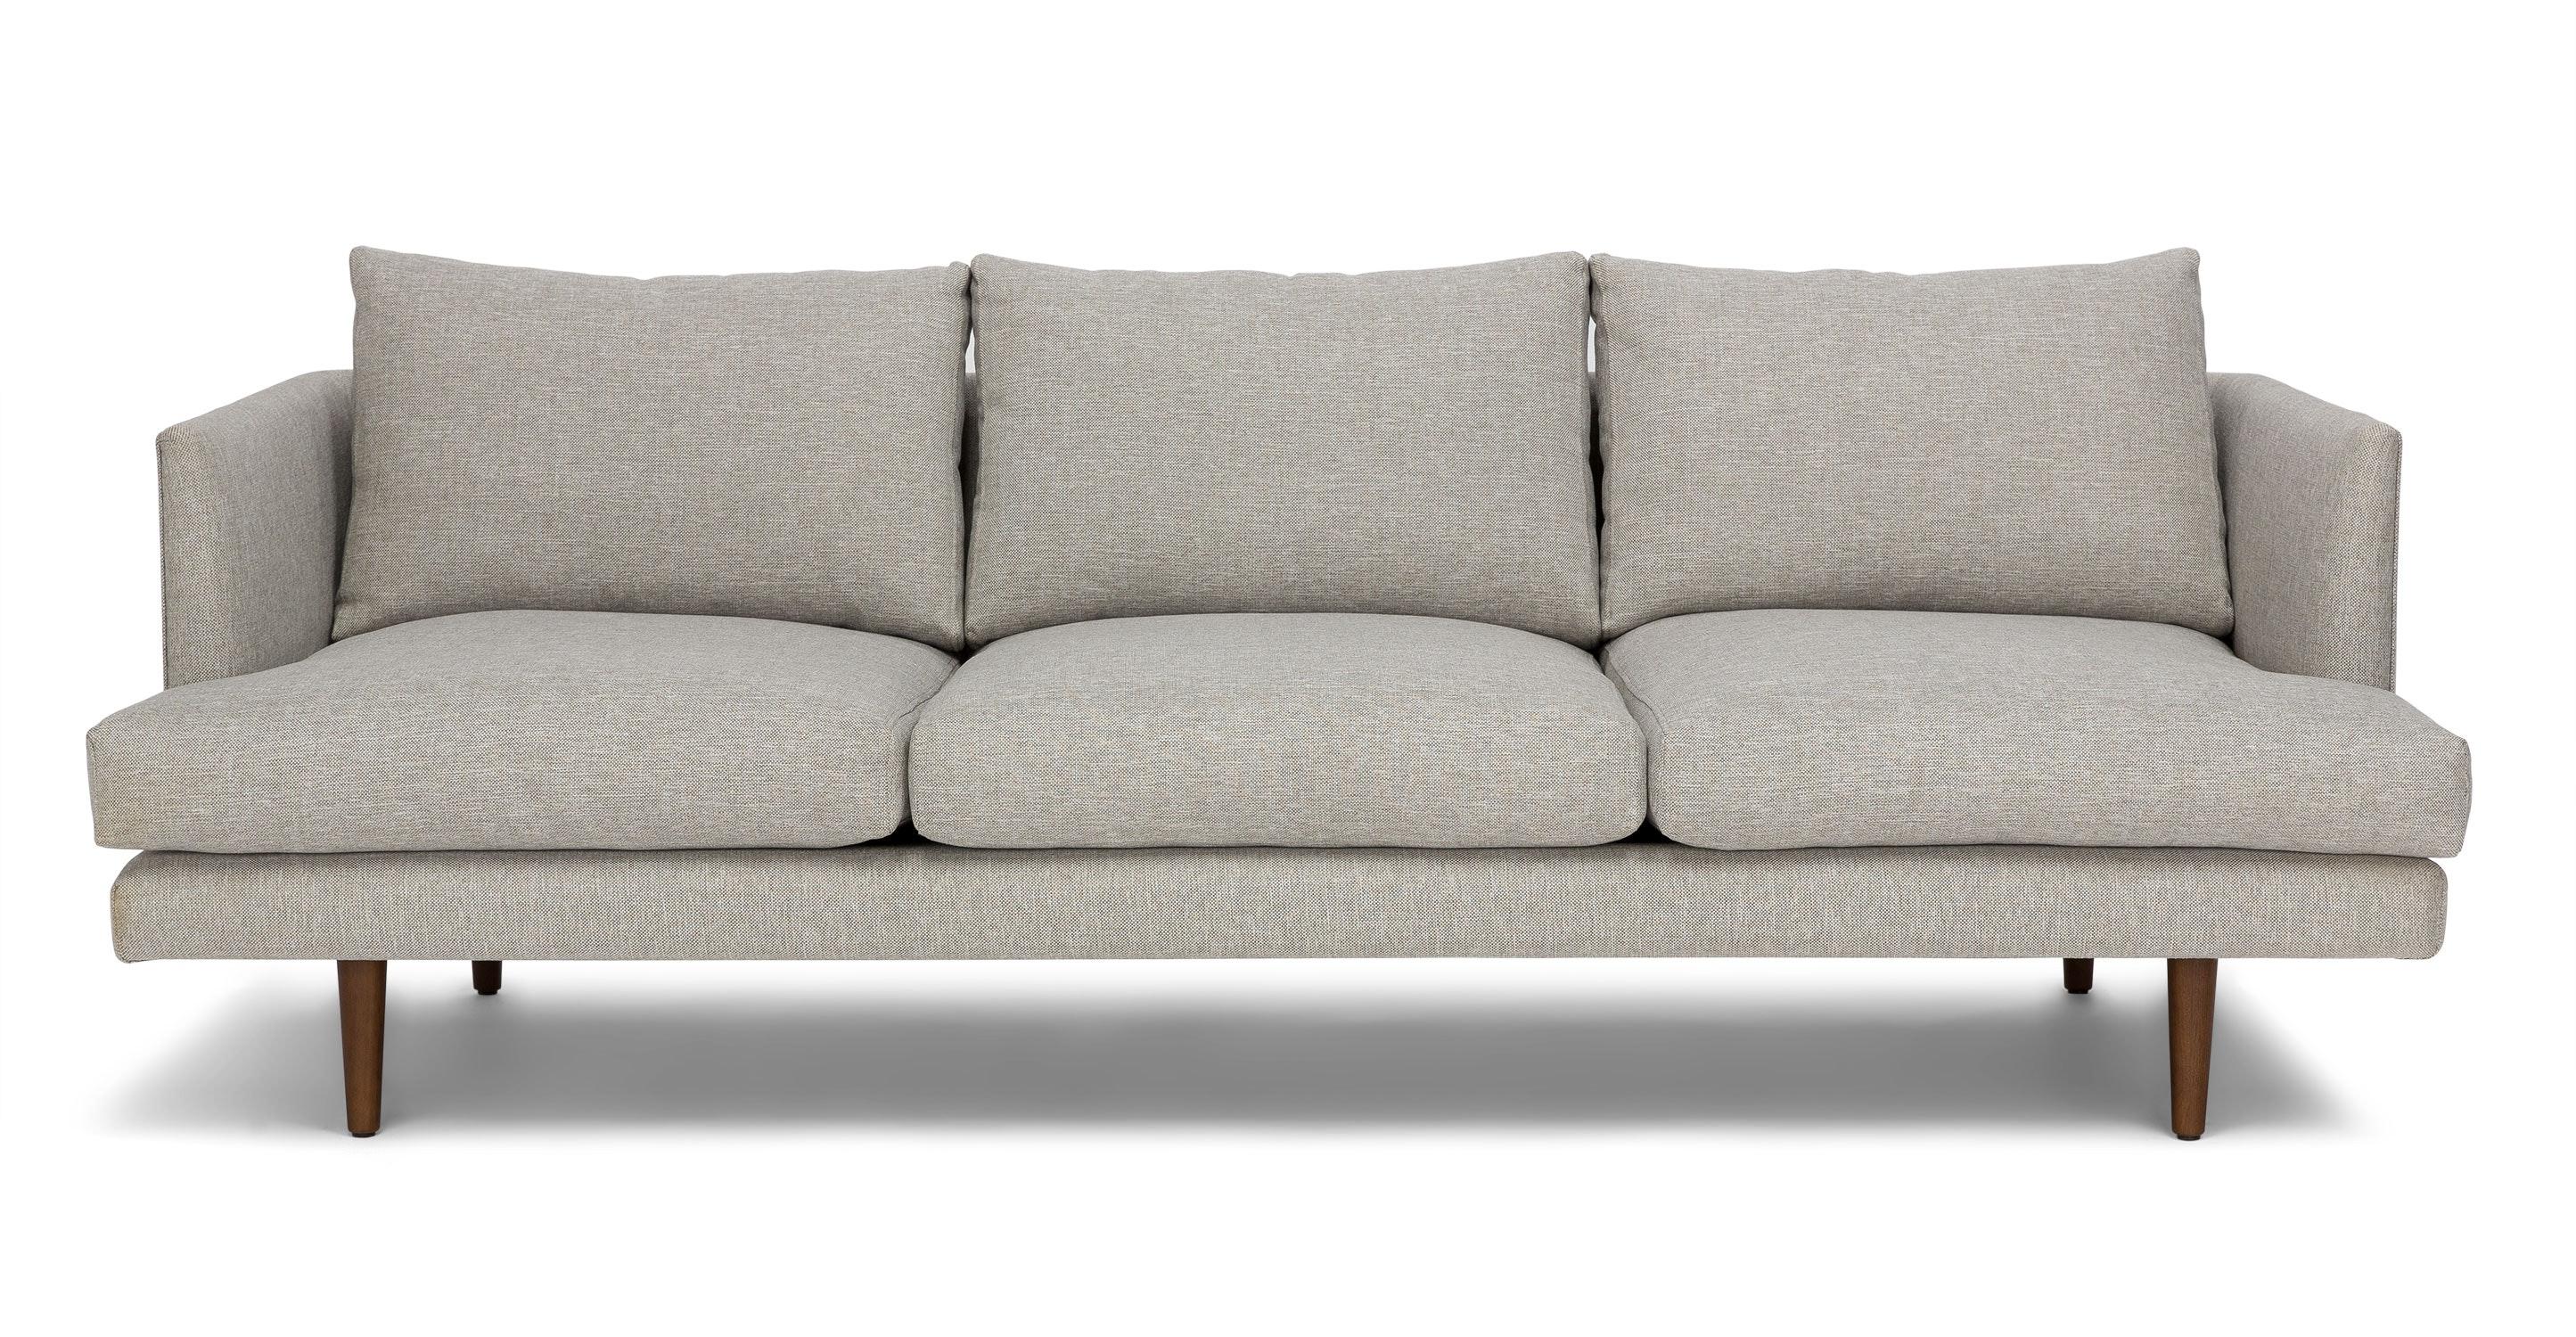 Burrard Seasalt Gray Sofa   Sofas   Article | Modern, Mid Century And  Scandinavian Furniture